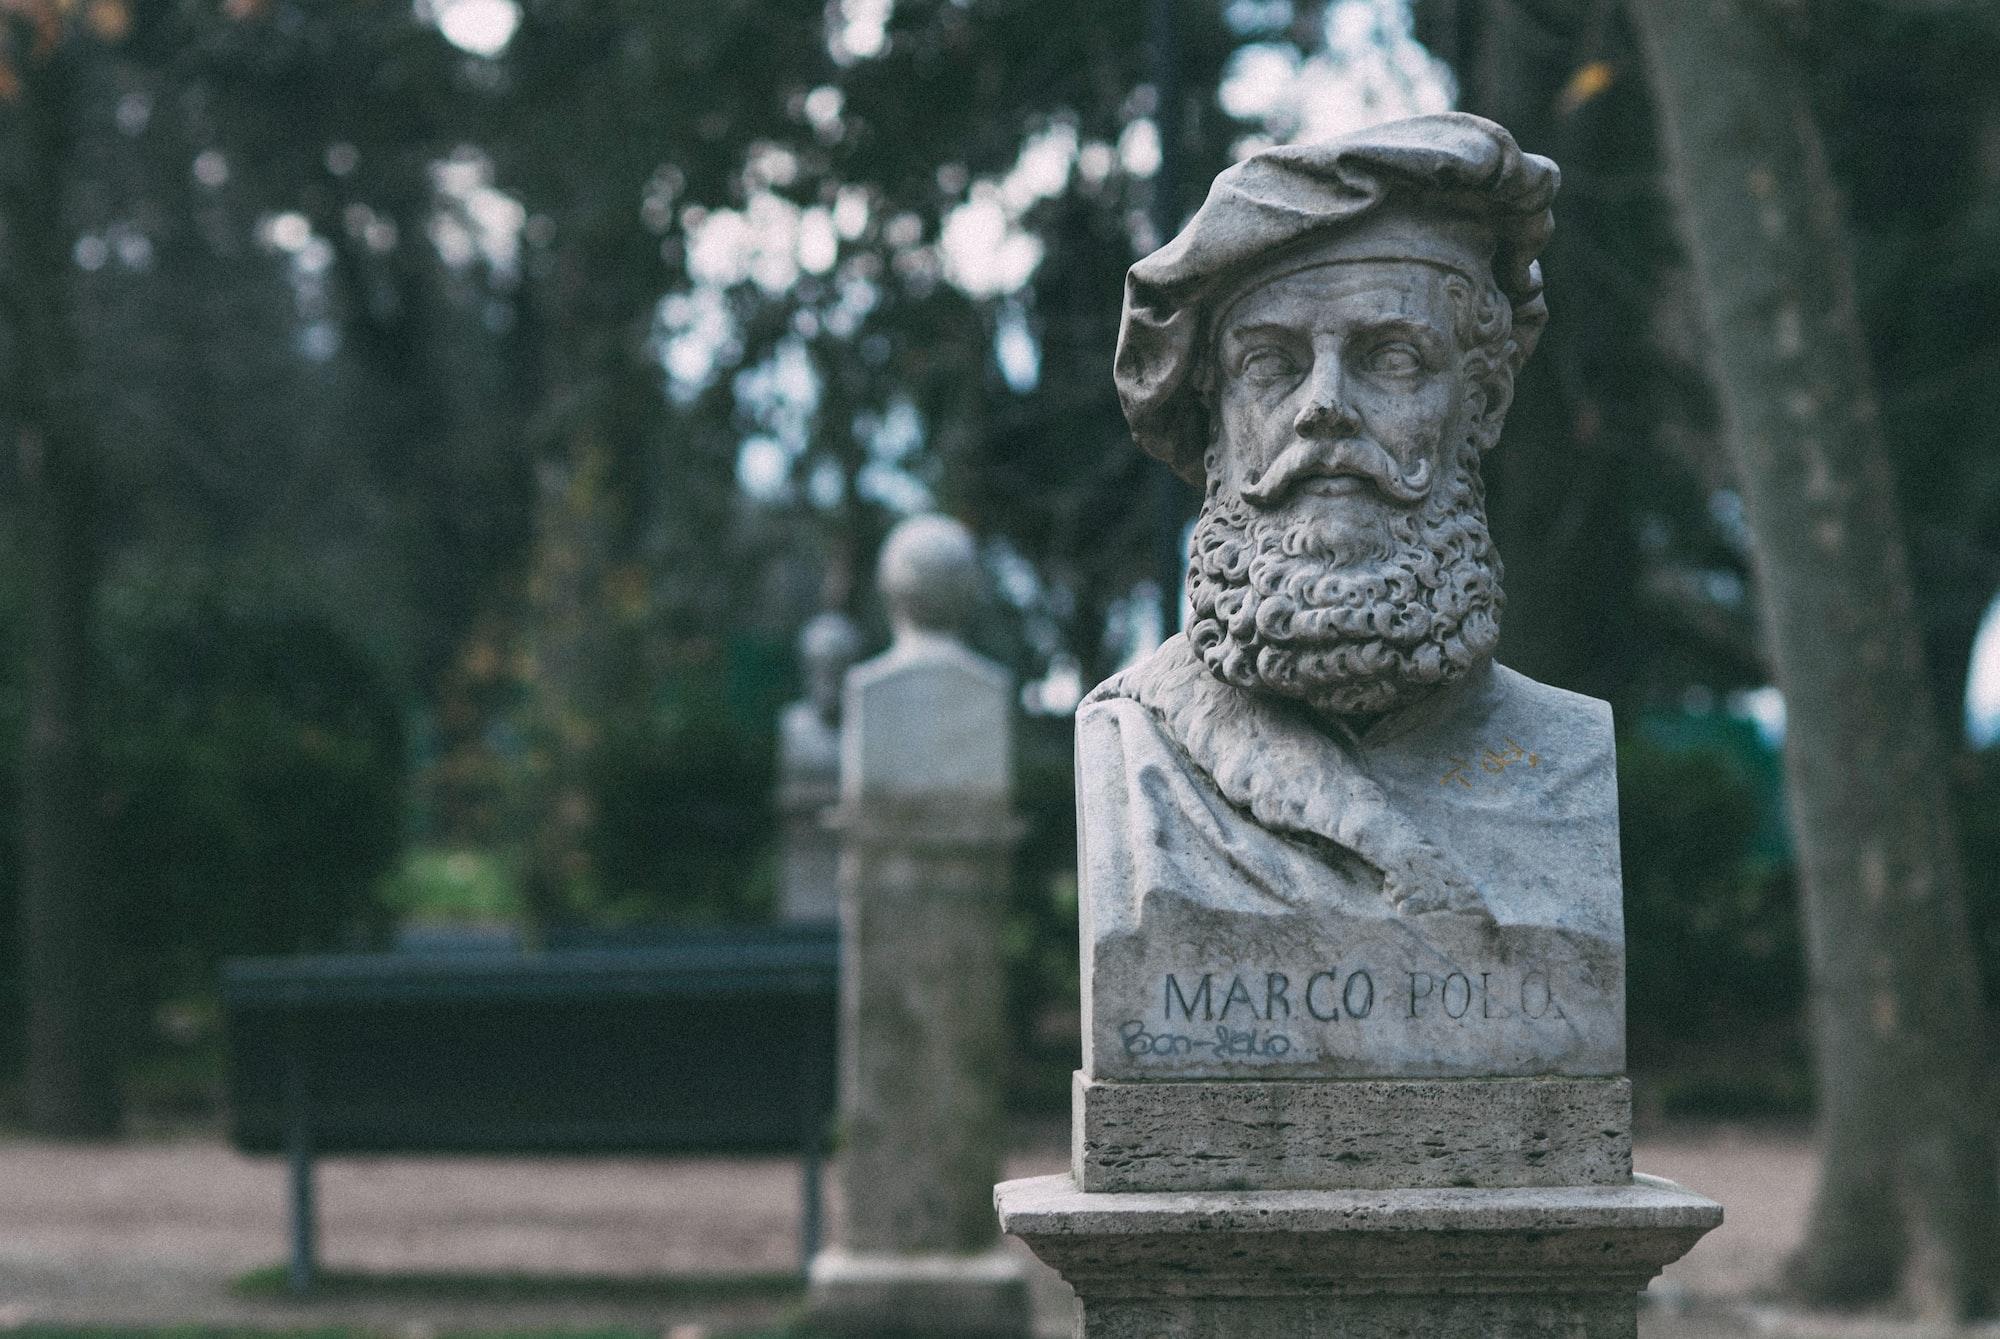 Sculptural bust of traveler Marco Polo.